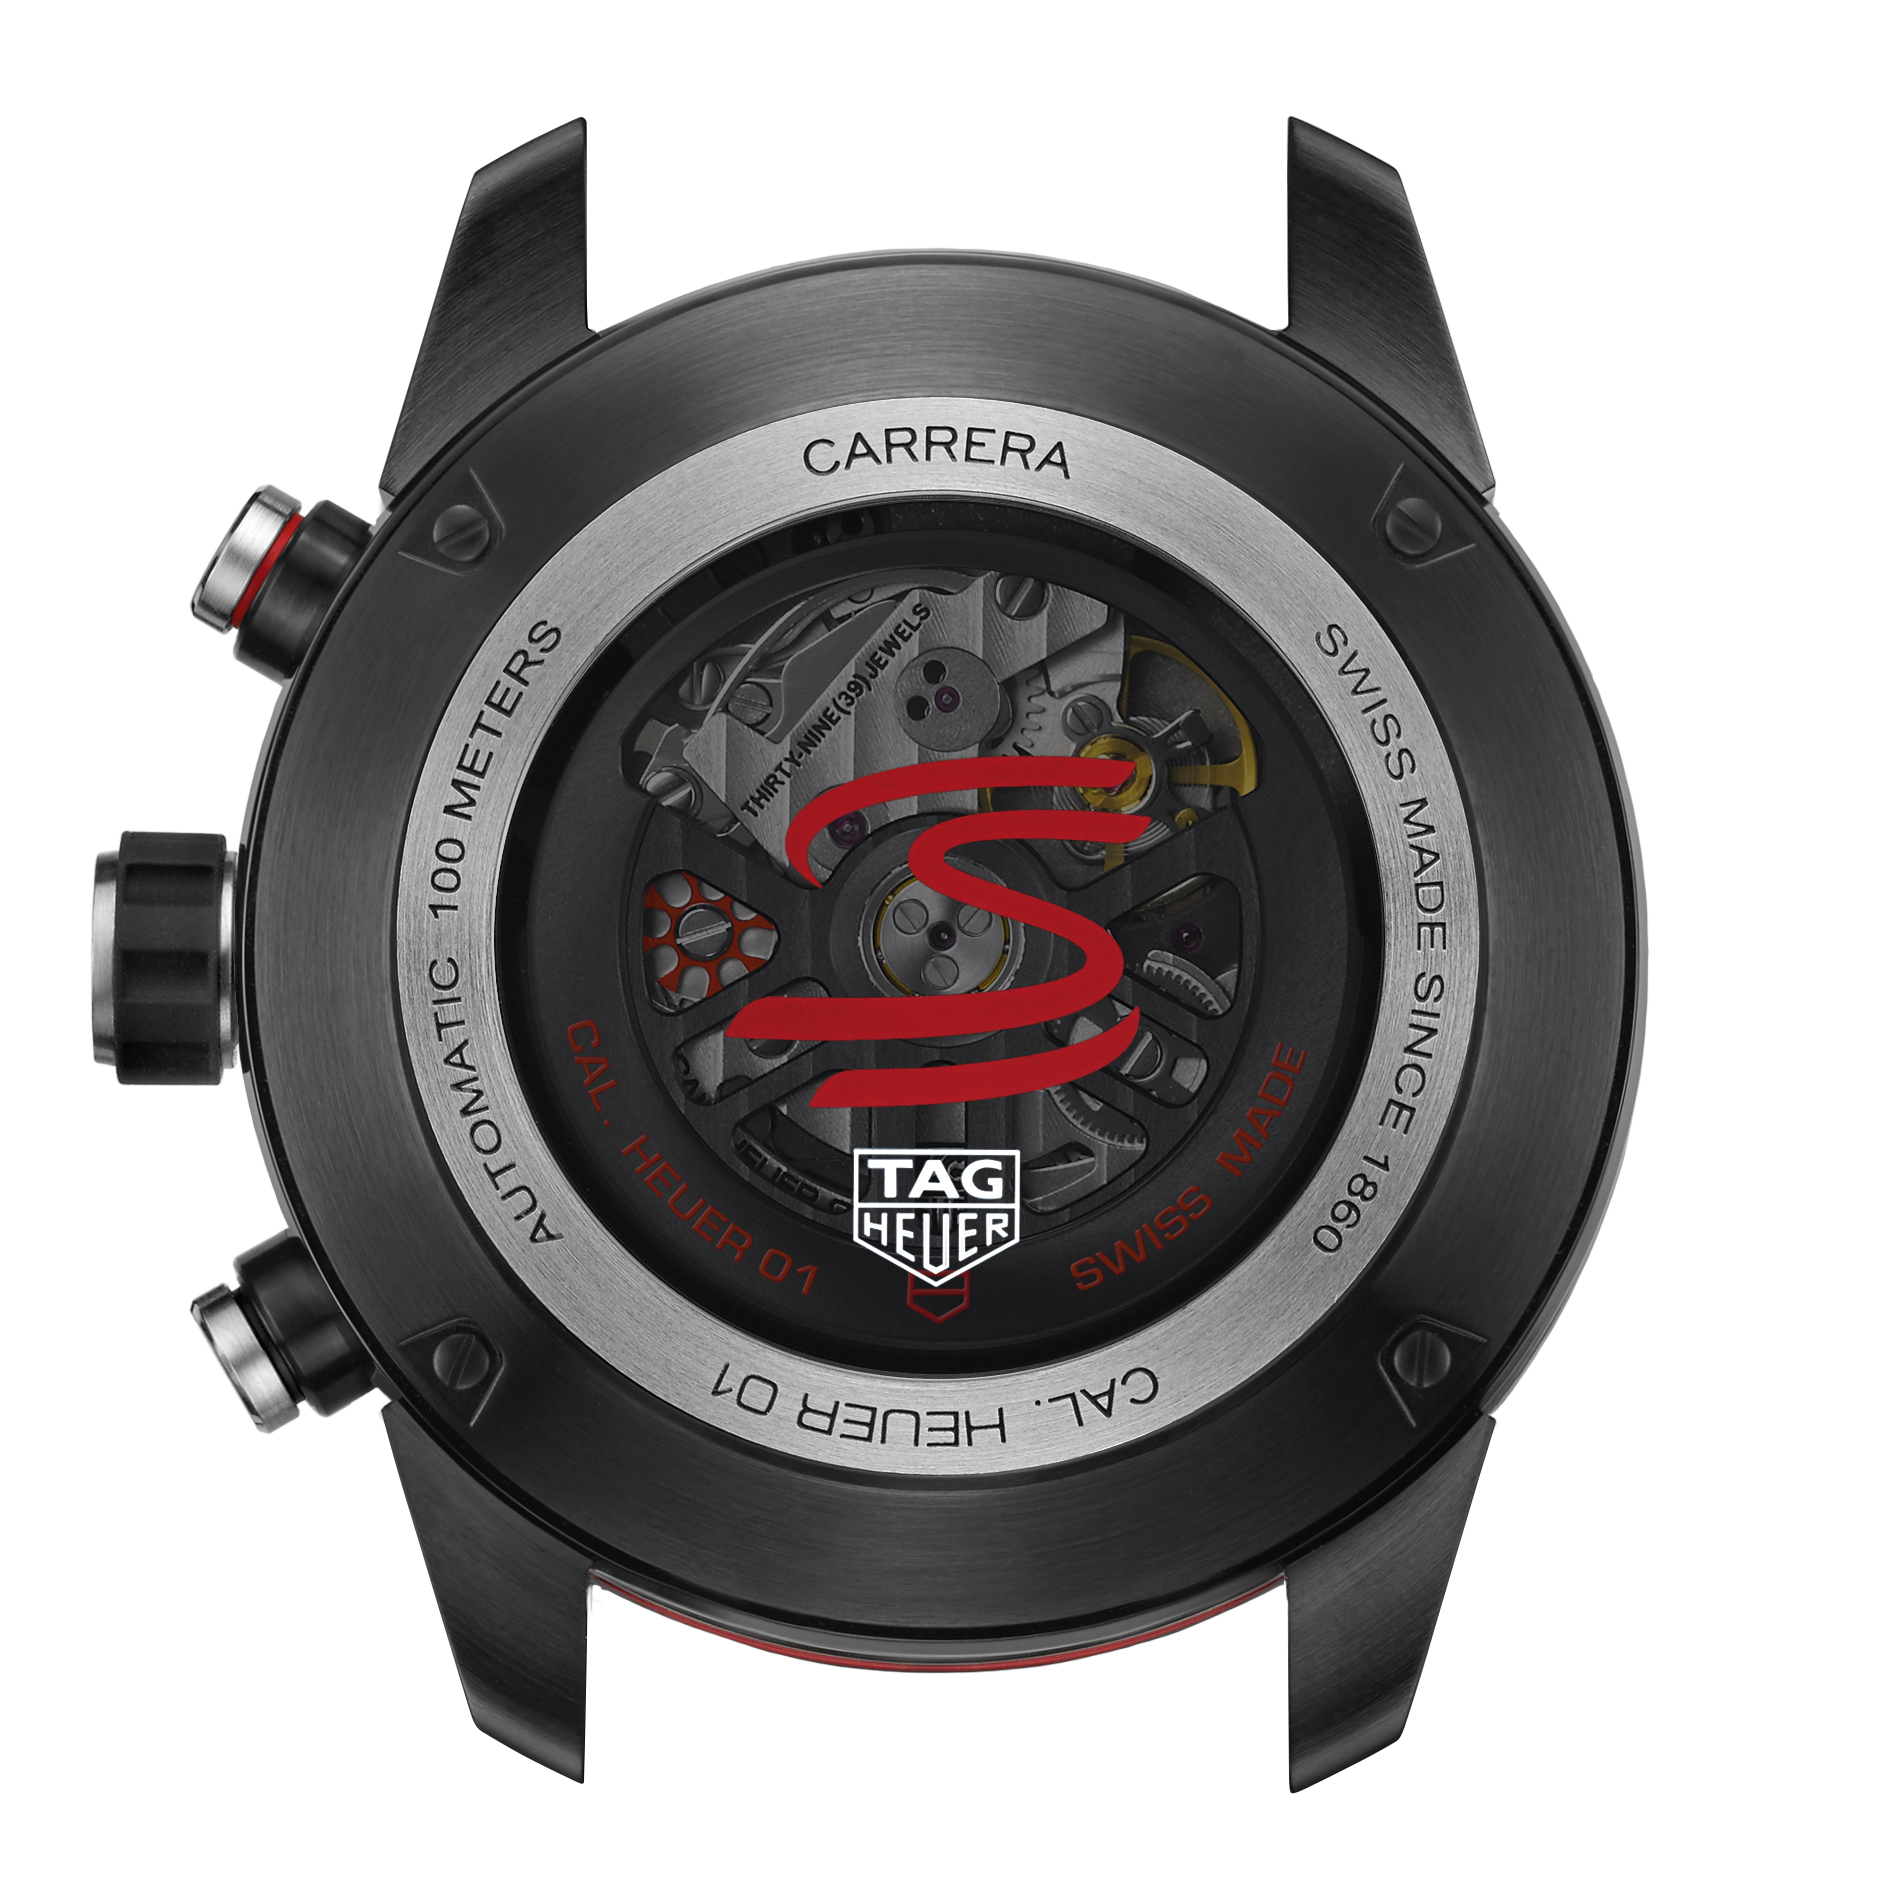 TAG HeuerCarrera Heuer-01 chronograph